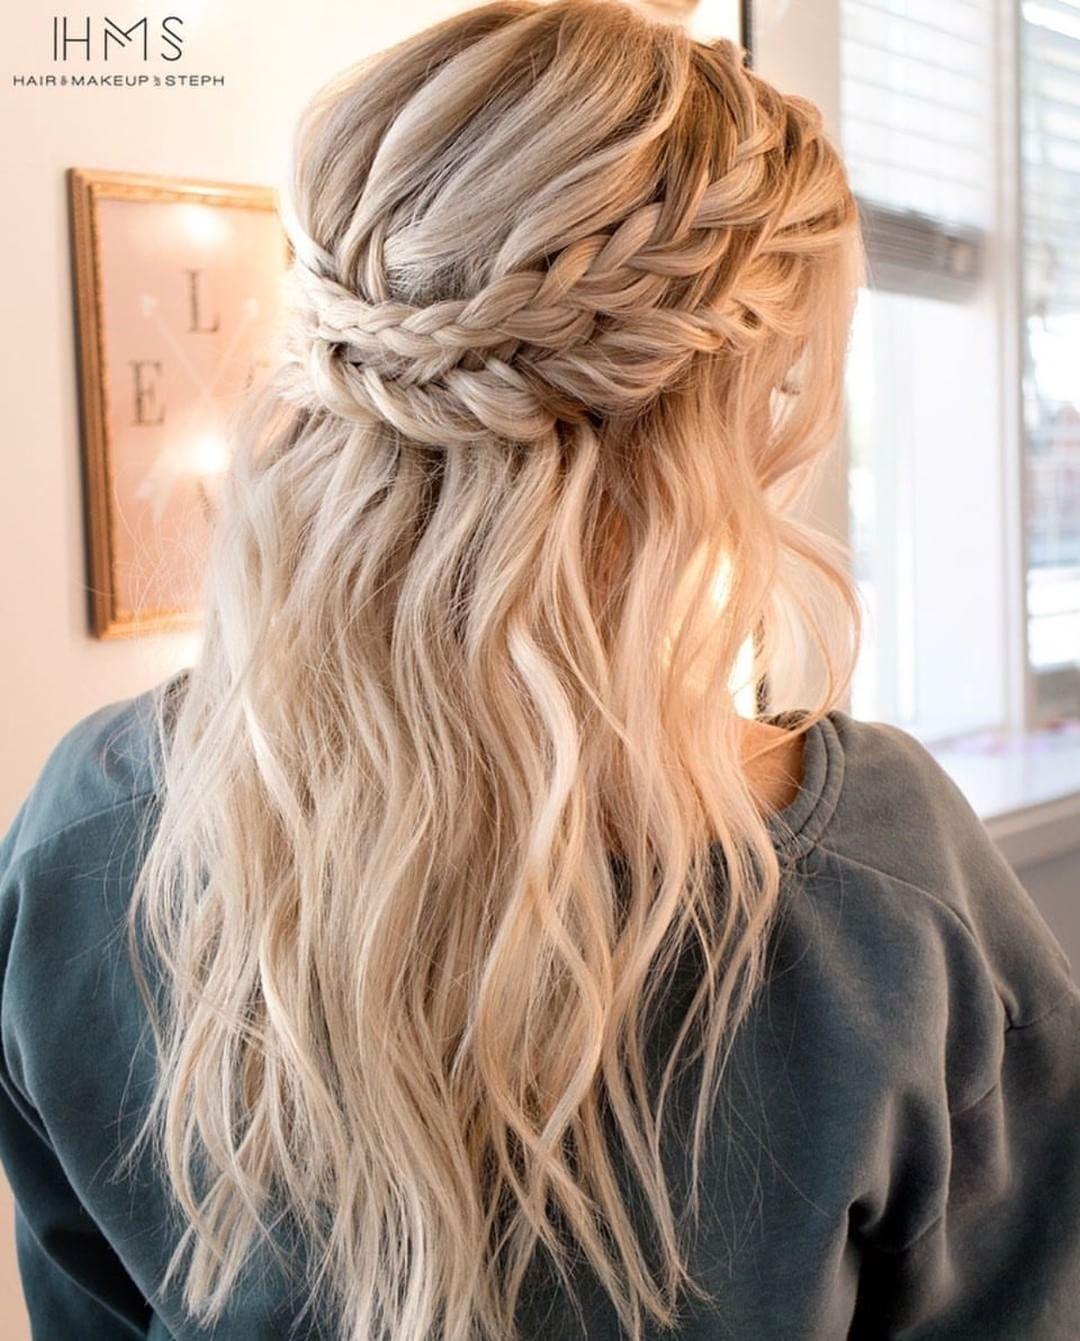 boho braids and beachy waves #hairinspo by @hairandmakeupbysteph ...